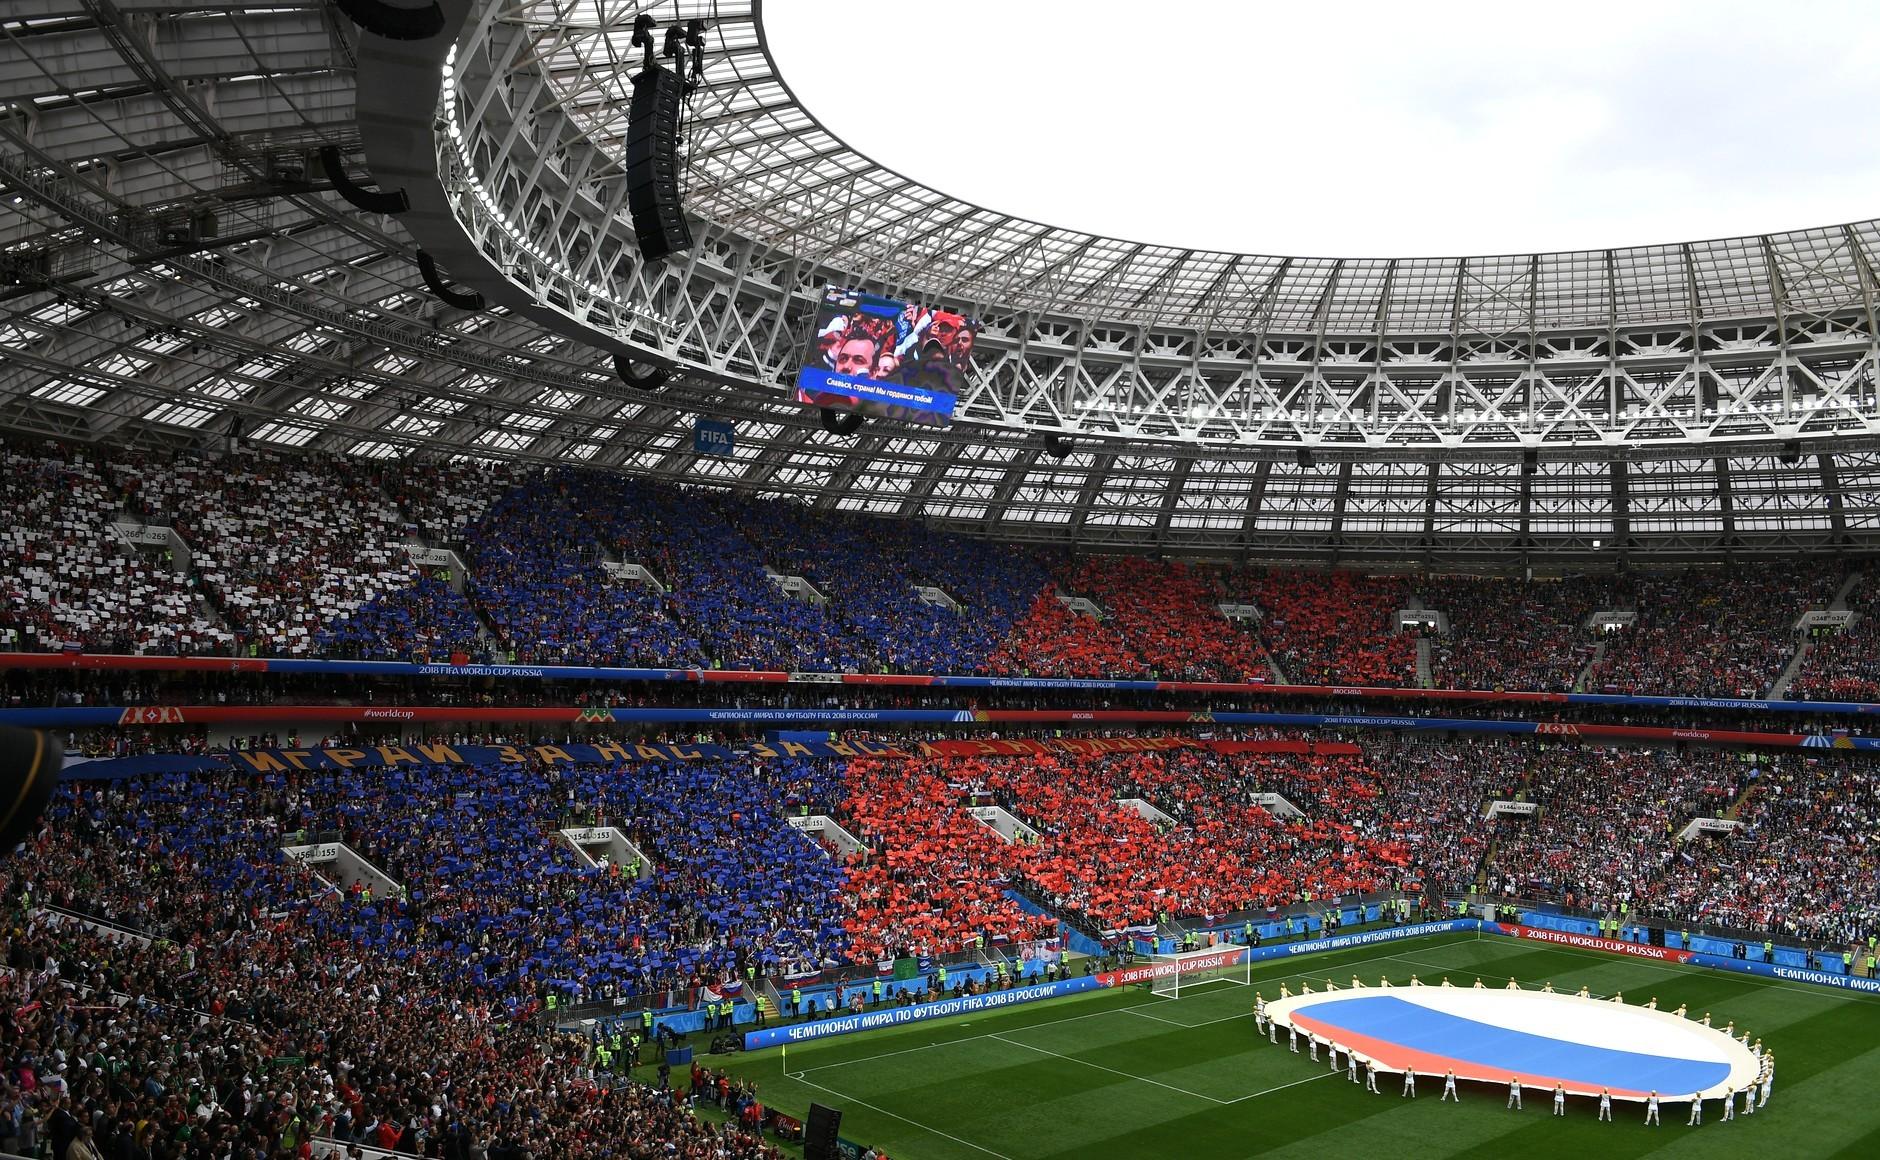 World Cup 2018 Luzhniki Stadium Stadiumdb Com